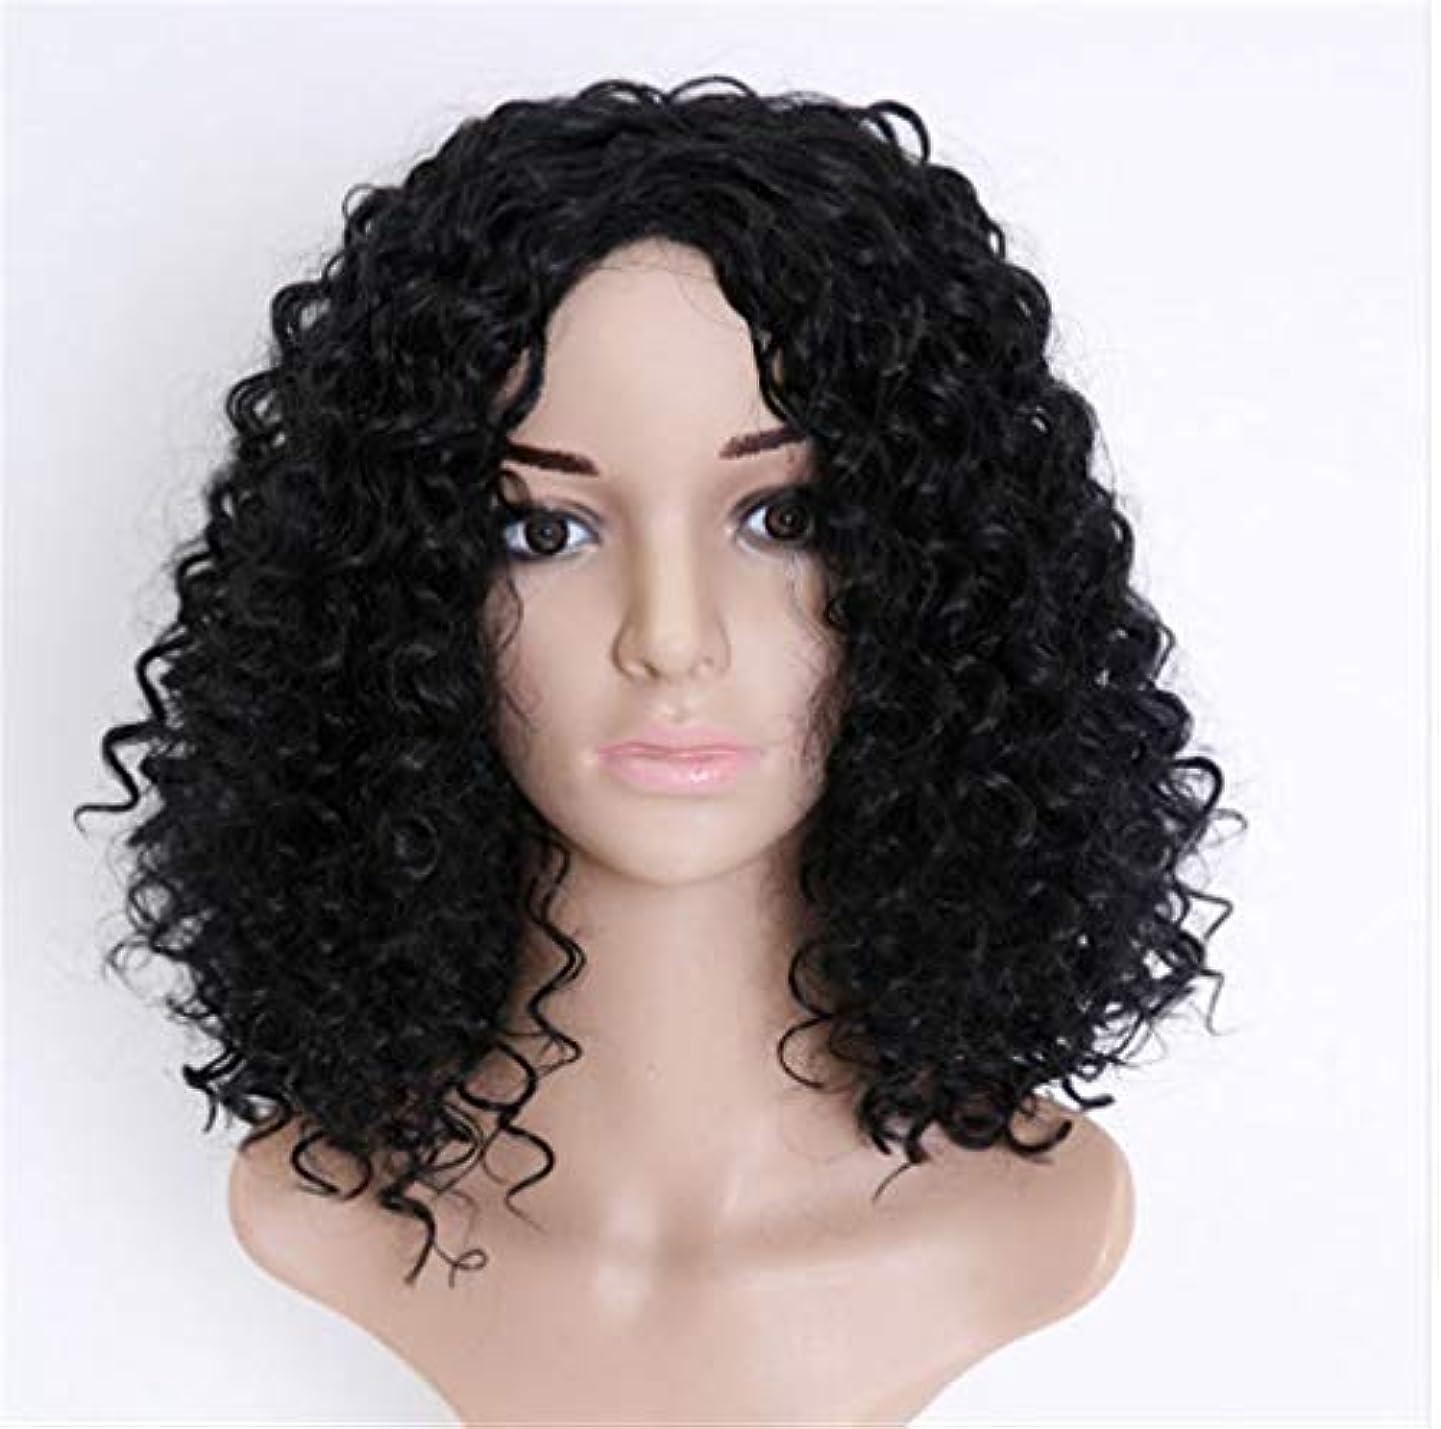 SRY-Wigファッション ファッション長い短い髪のかつらかつらヨーロッパやアメリカの短い巻き毛のかつら女性のアフリカの少量の爆発ヘッド化学繊維かつら (Color : Black)